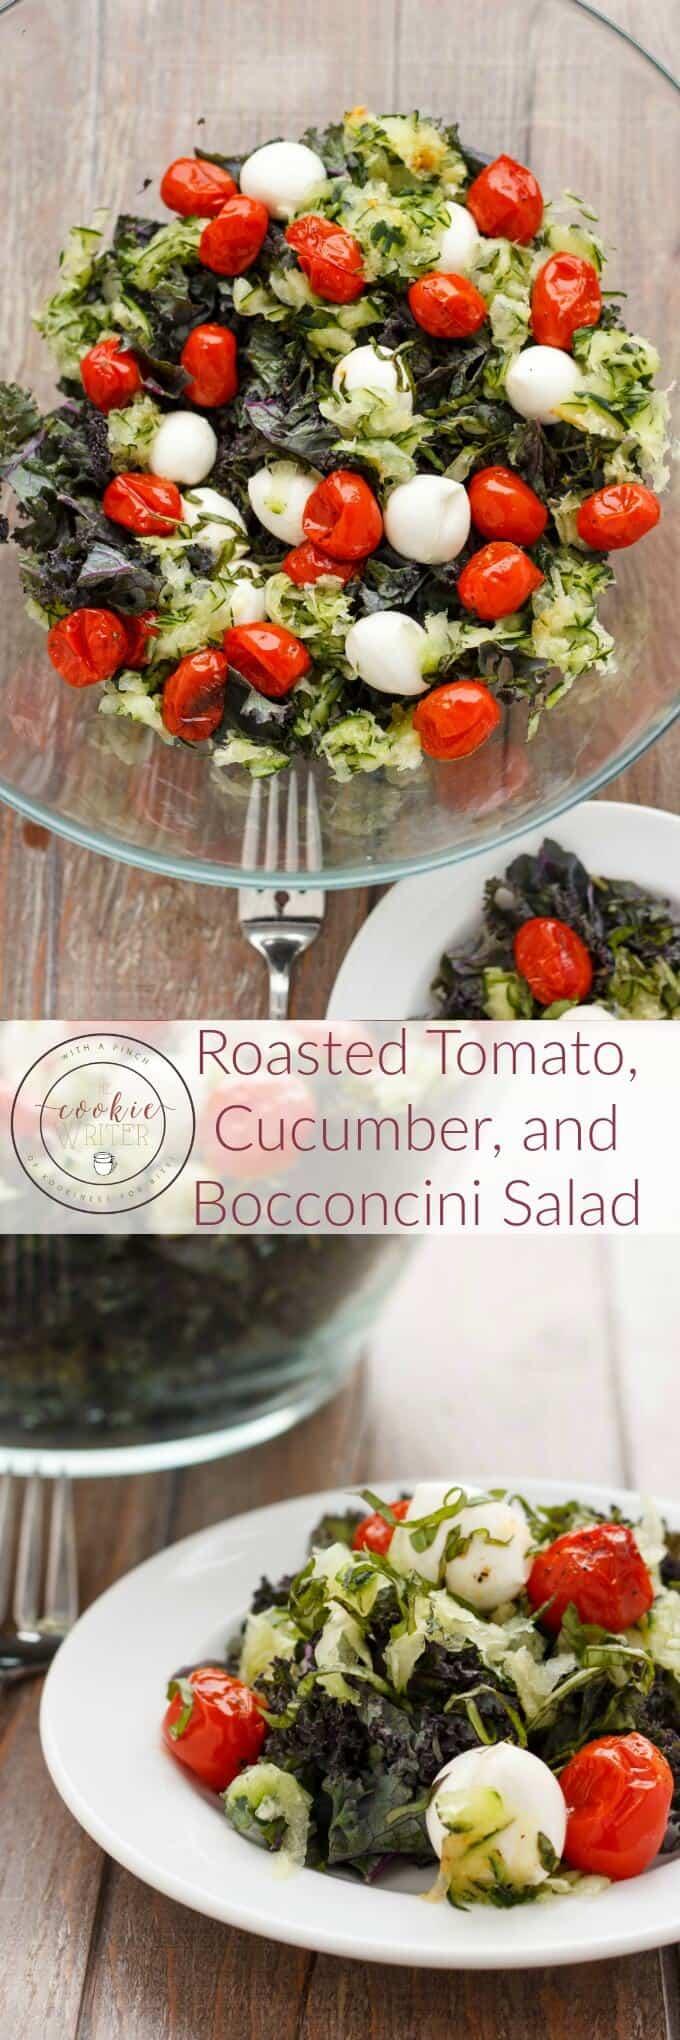 Roasted Tomato, Cucumber, and Bocconcini Salad